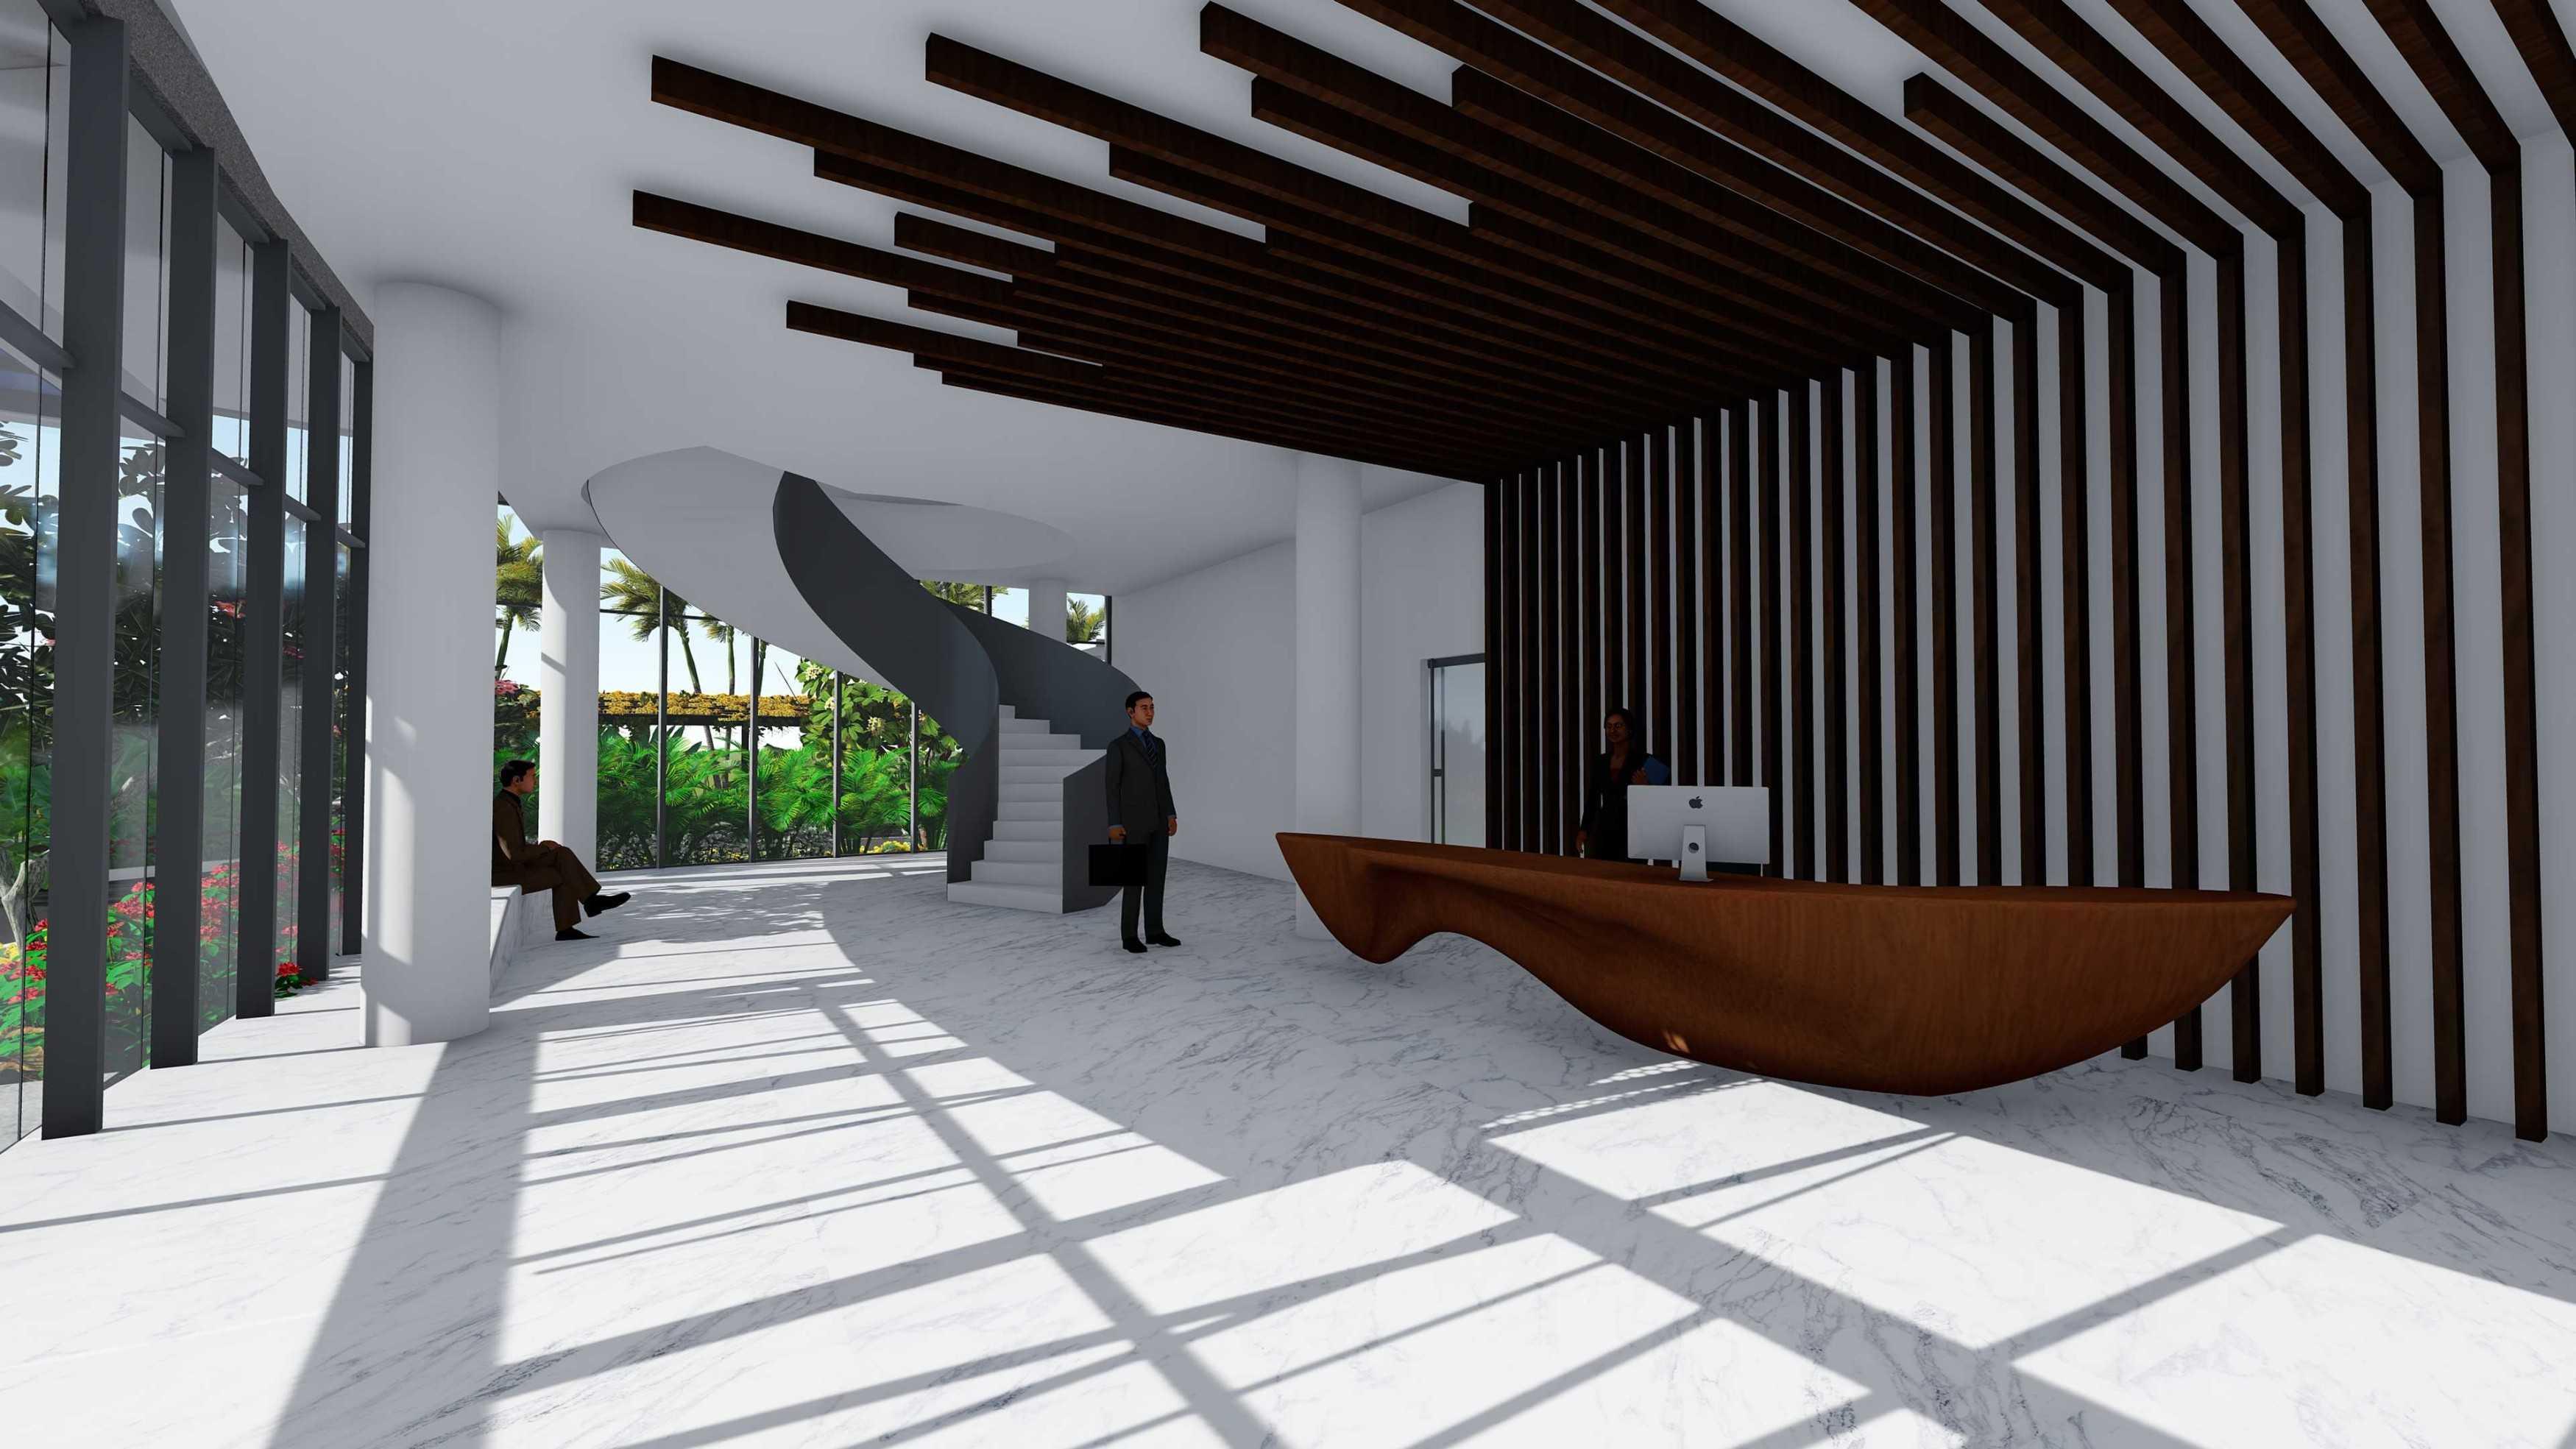 Raaj Gill Arsitek Aari Office Building & Laboratory Pekanbaru, Kota Pekanbaru, Riau, Indonesia Pekanbaru, Kota Pekanbaru, Riau, Indonesia Raaj-Gill-Arsitek-Aari-Office-Building-Laboratory   74663